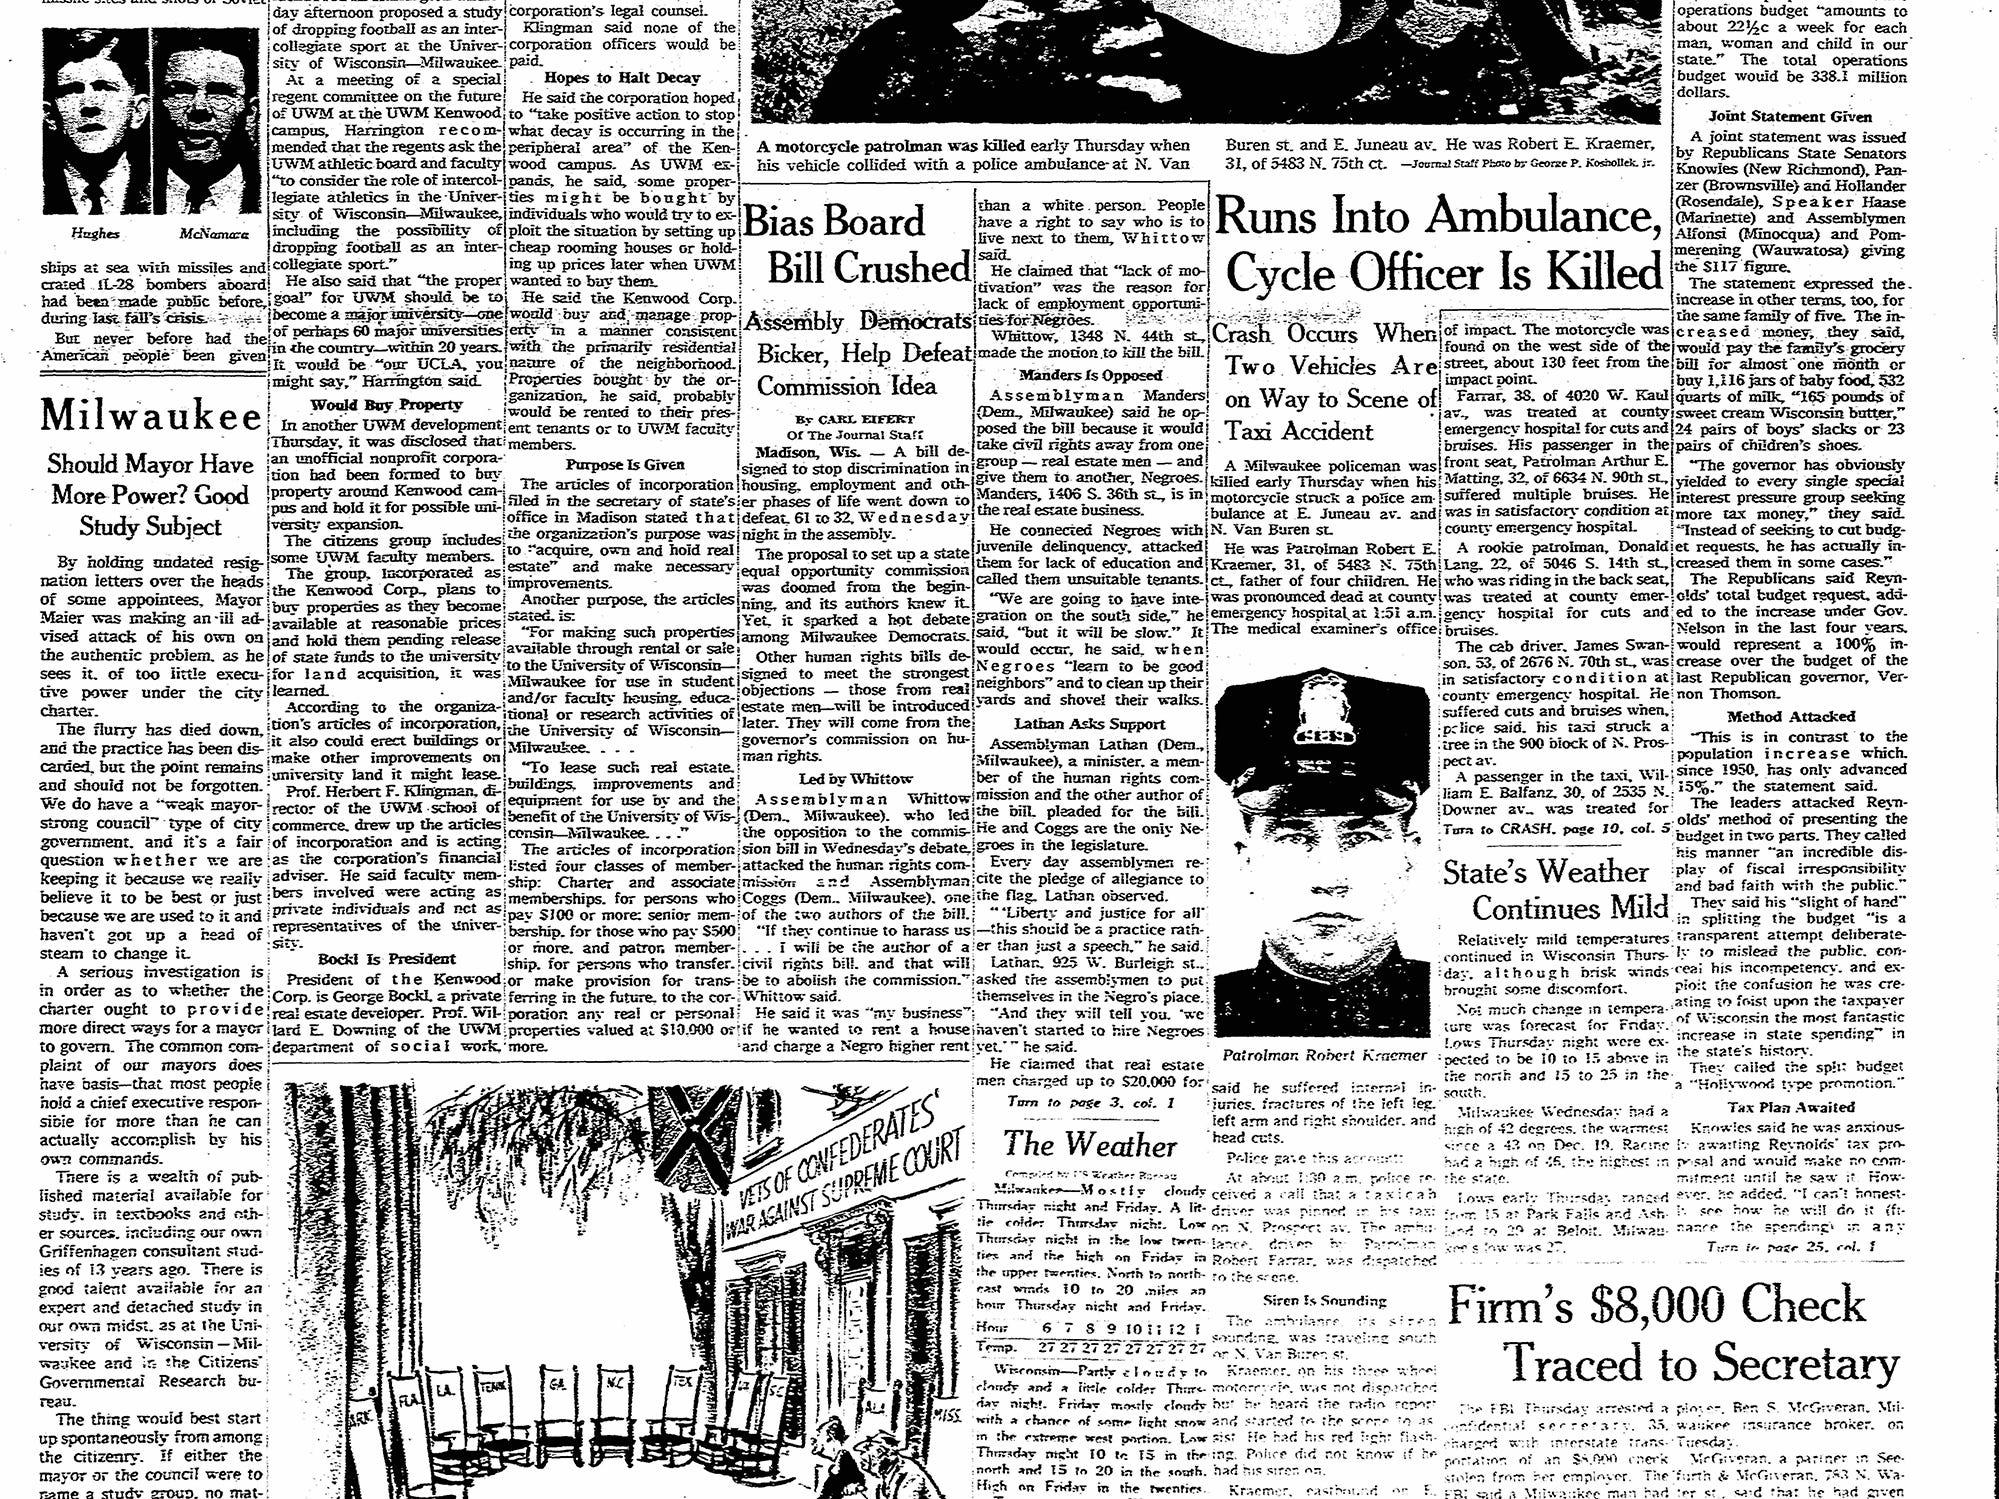 Robert Kraemer Start of duty: February 22, 1960      End of watch: February 7, 1963